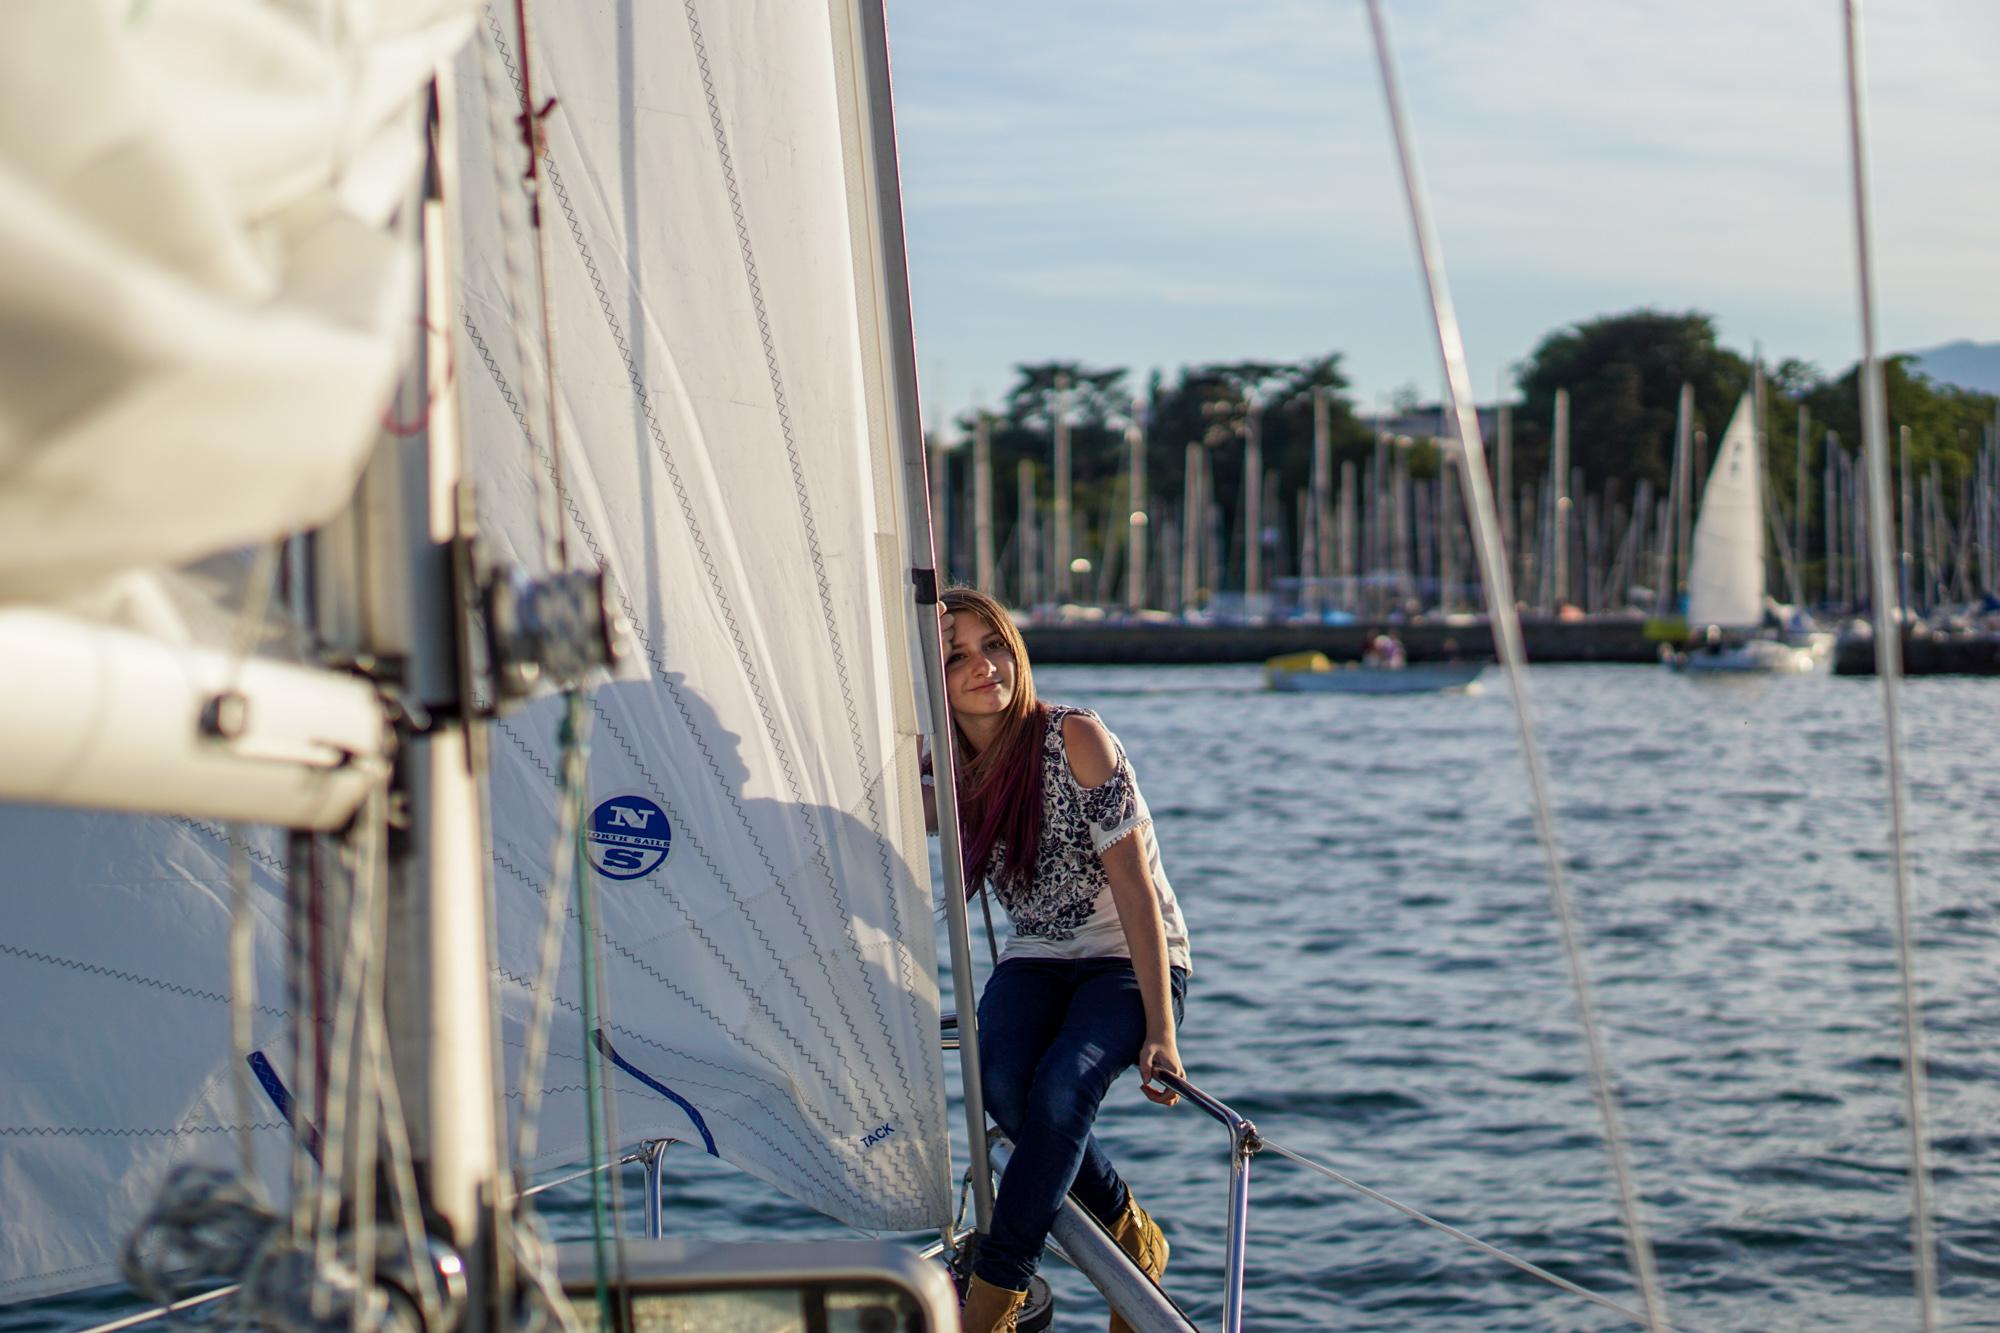 Sailing at Lac Léman with friends near Geneva, Switzerland.